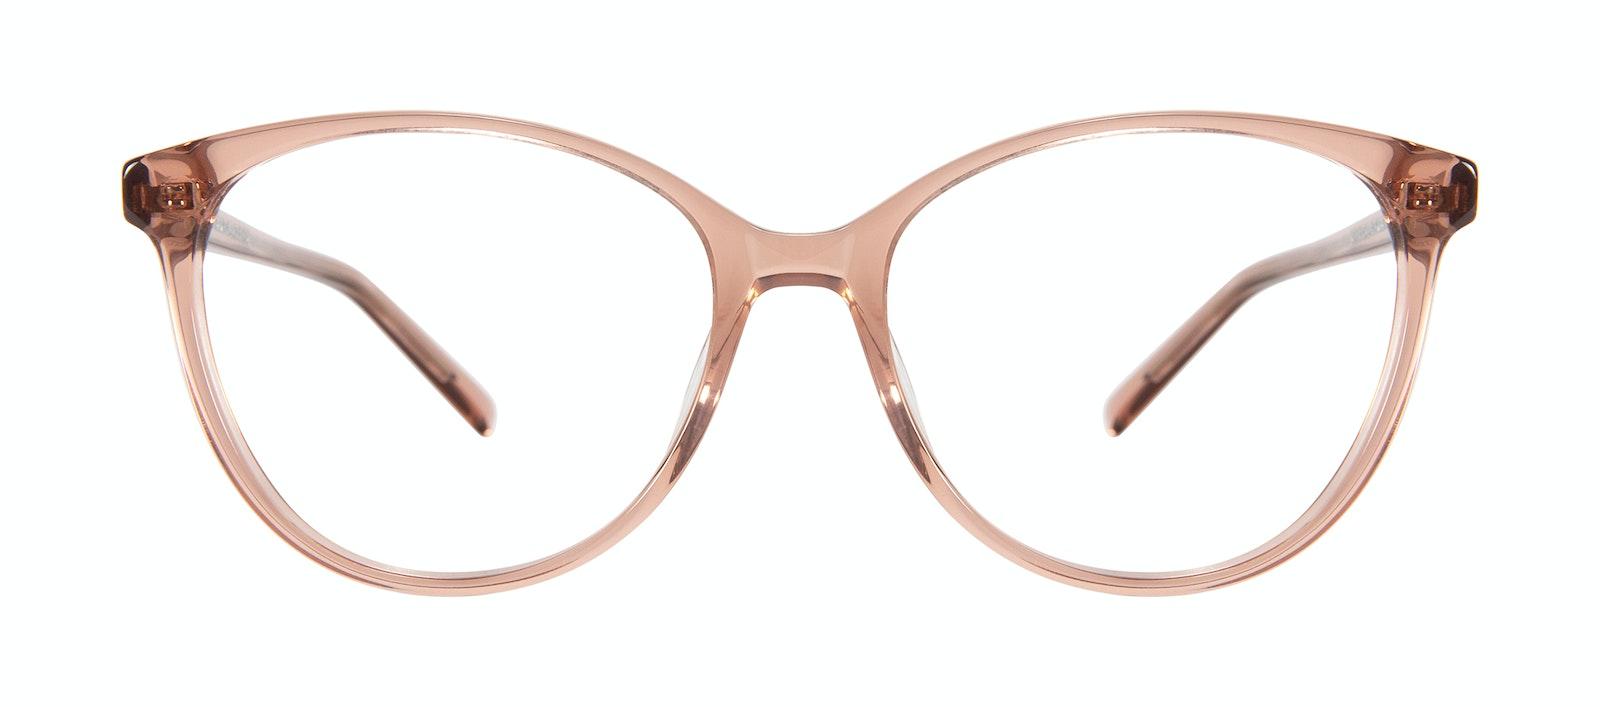 Affordable Fashion Glasses Cat Eye Eyeglasses Women Imagine XL Rose Front